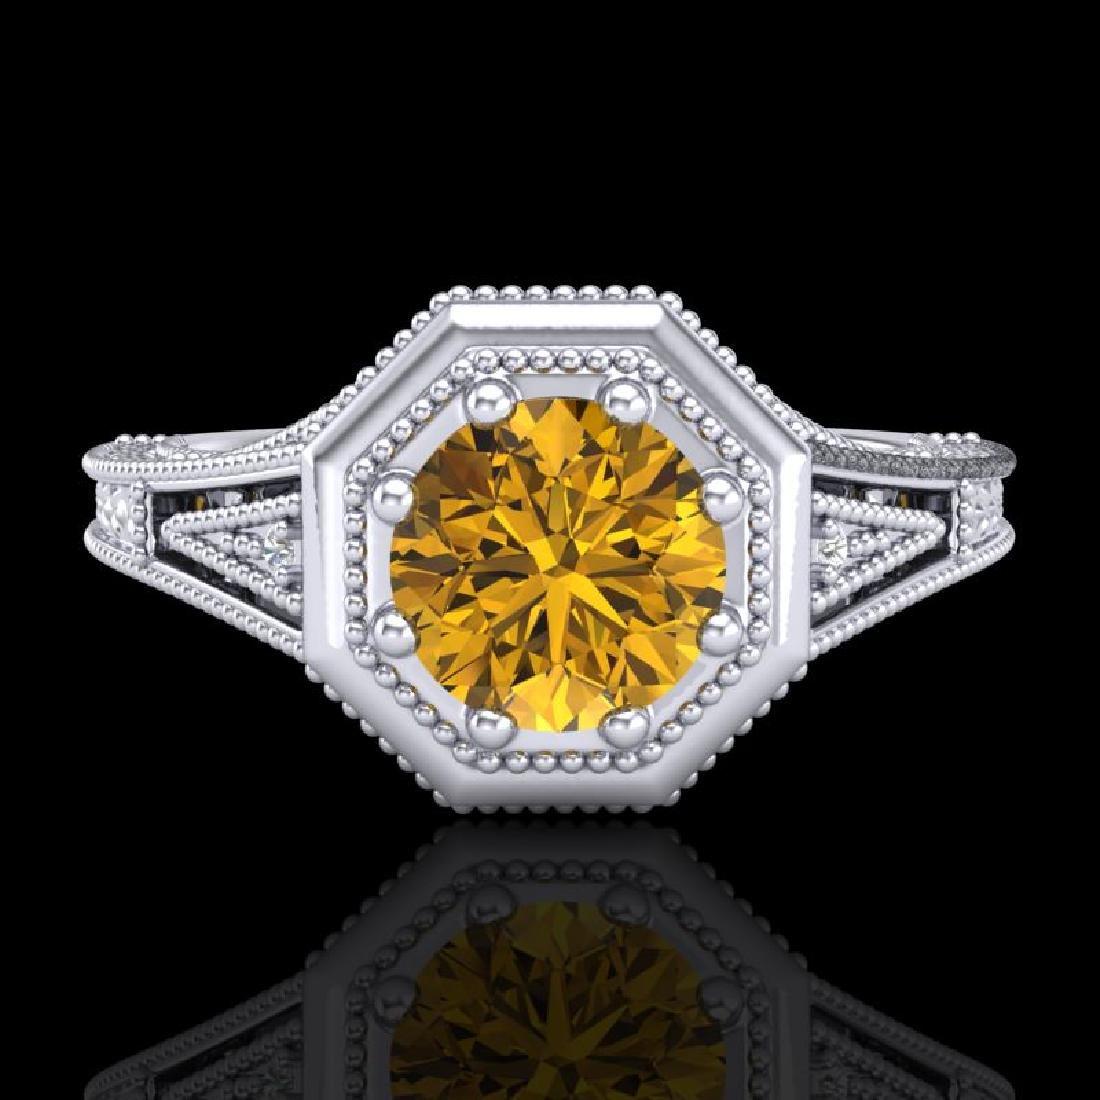 0.84 CTW Intense Fancy Yellow Diamond Engagement Art - 2